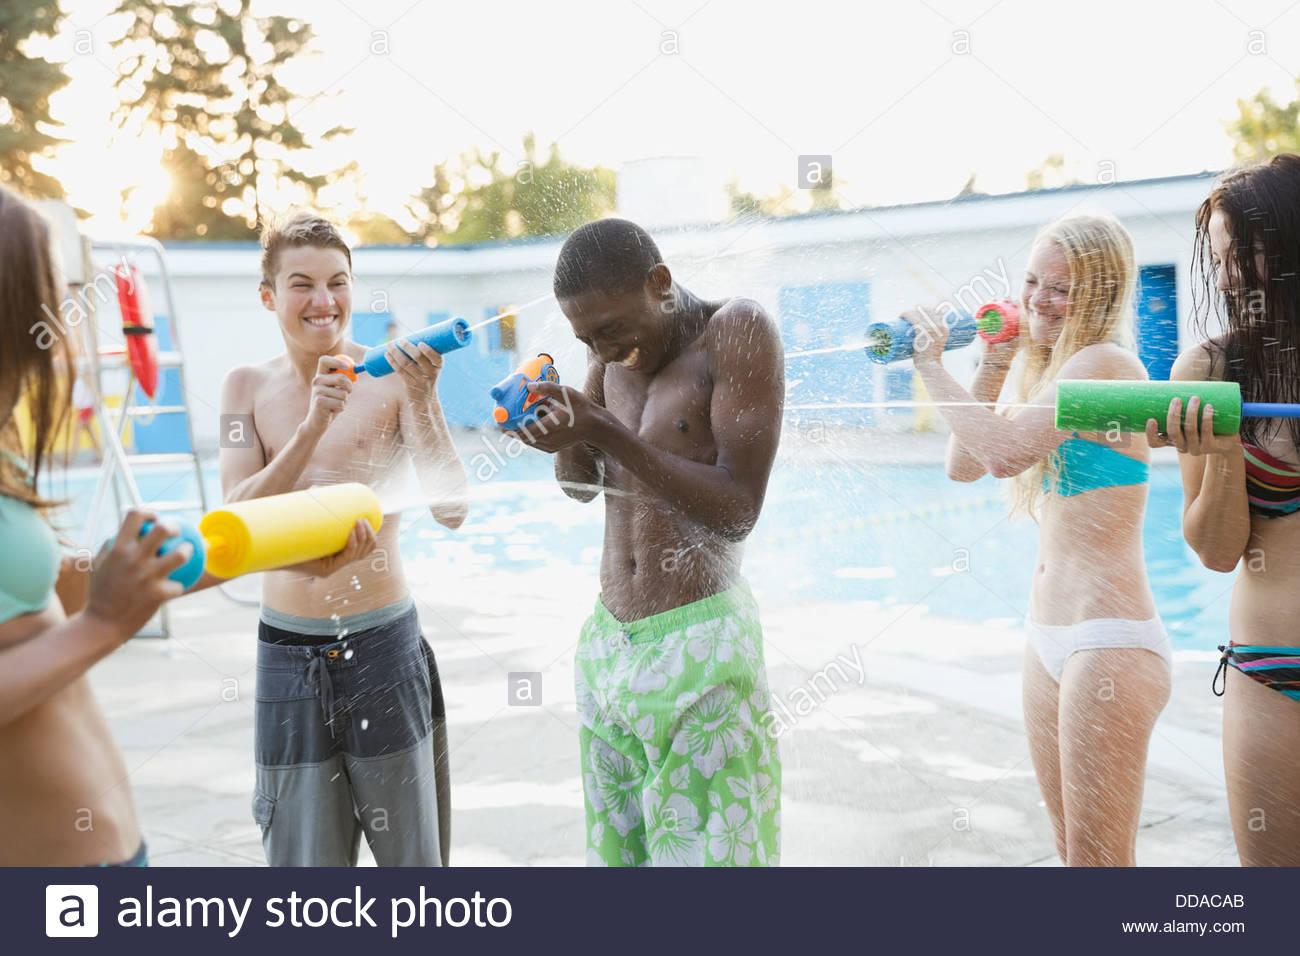 Teenagers having water gun fight by swimming pool - Stock Image